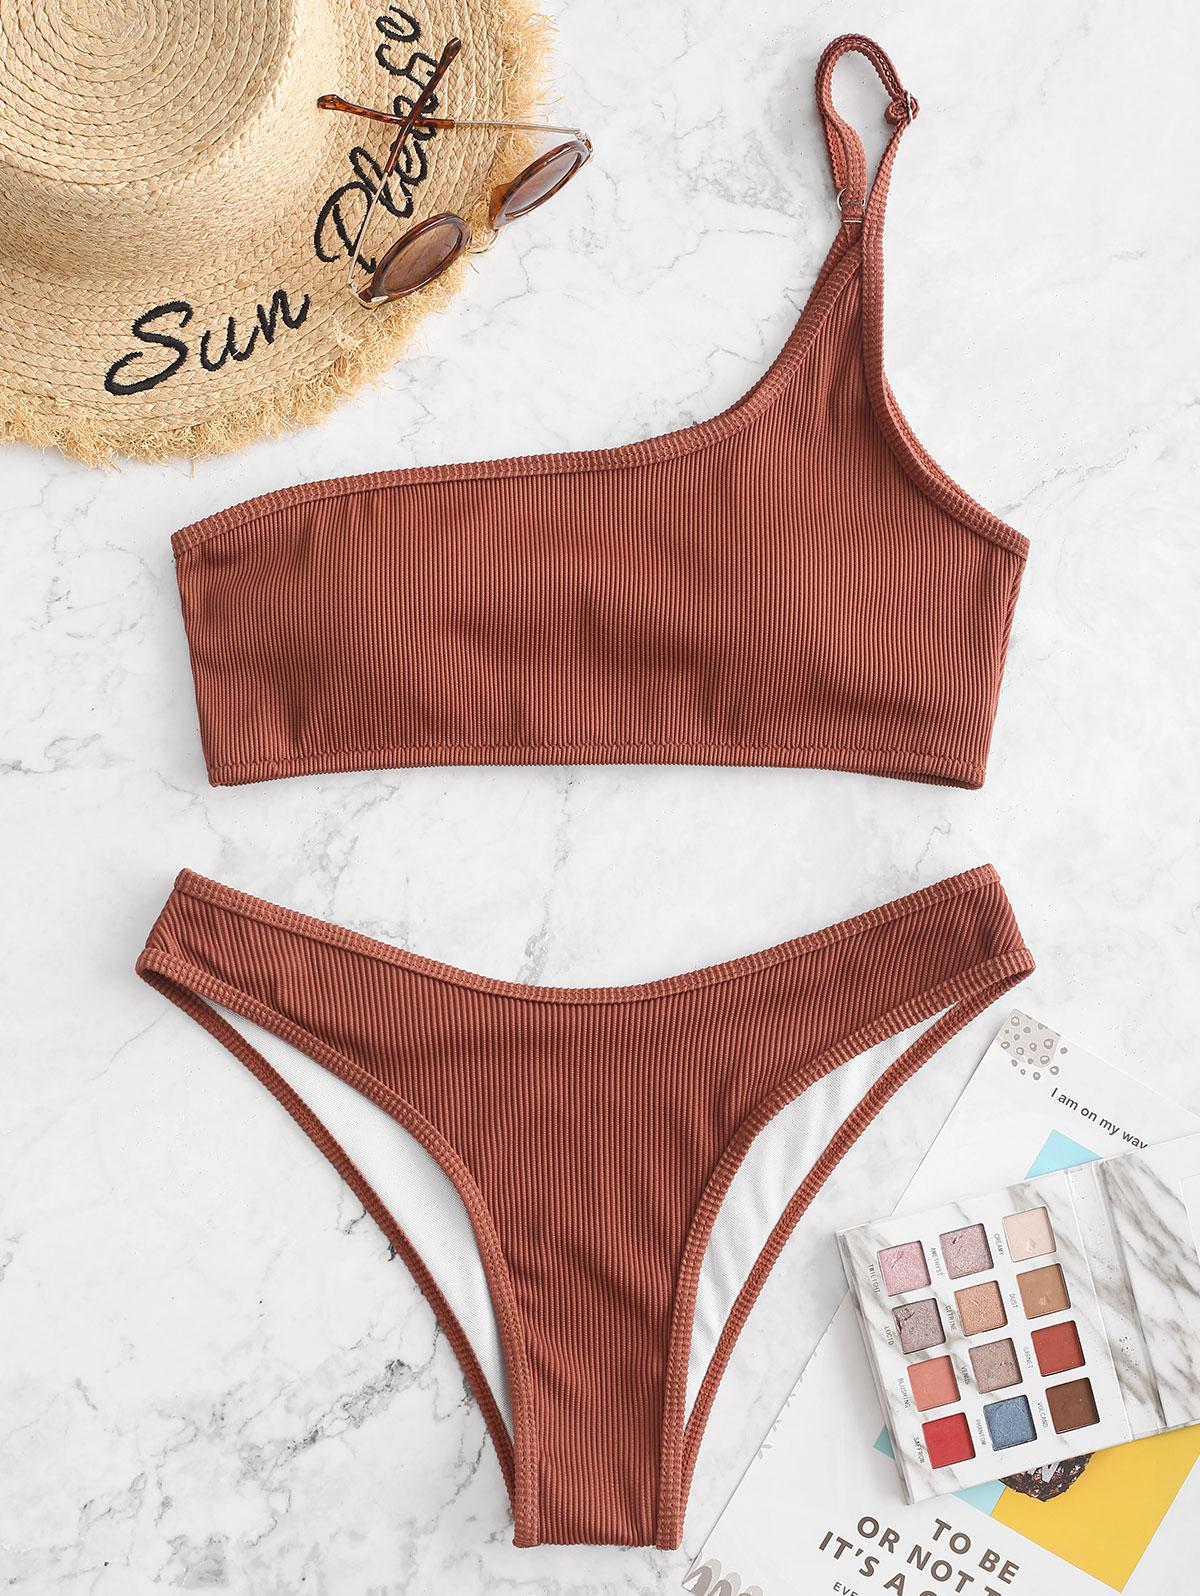 ZAFUL Textured Ribbed One Shoulder Bikini Swimsuit, Chestnut